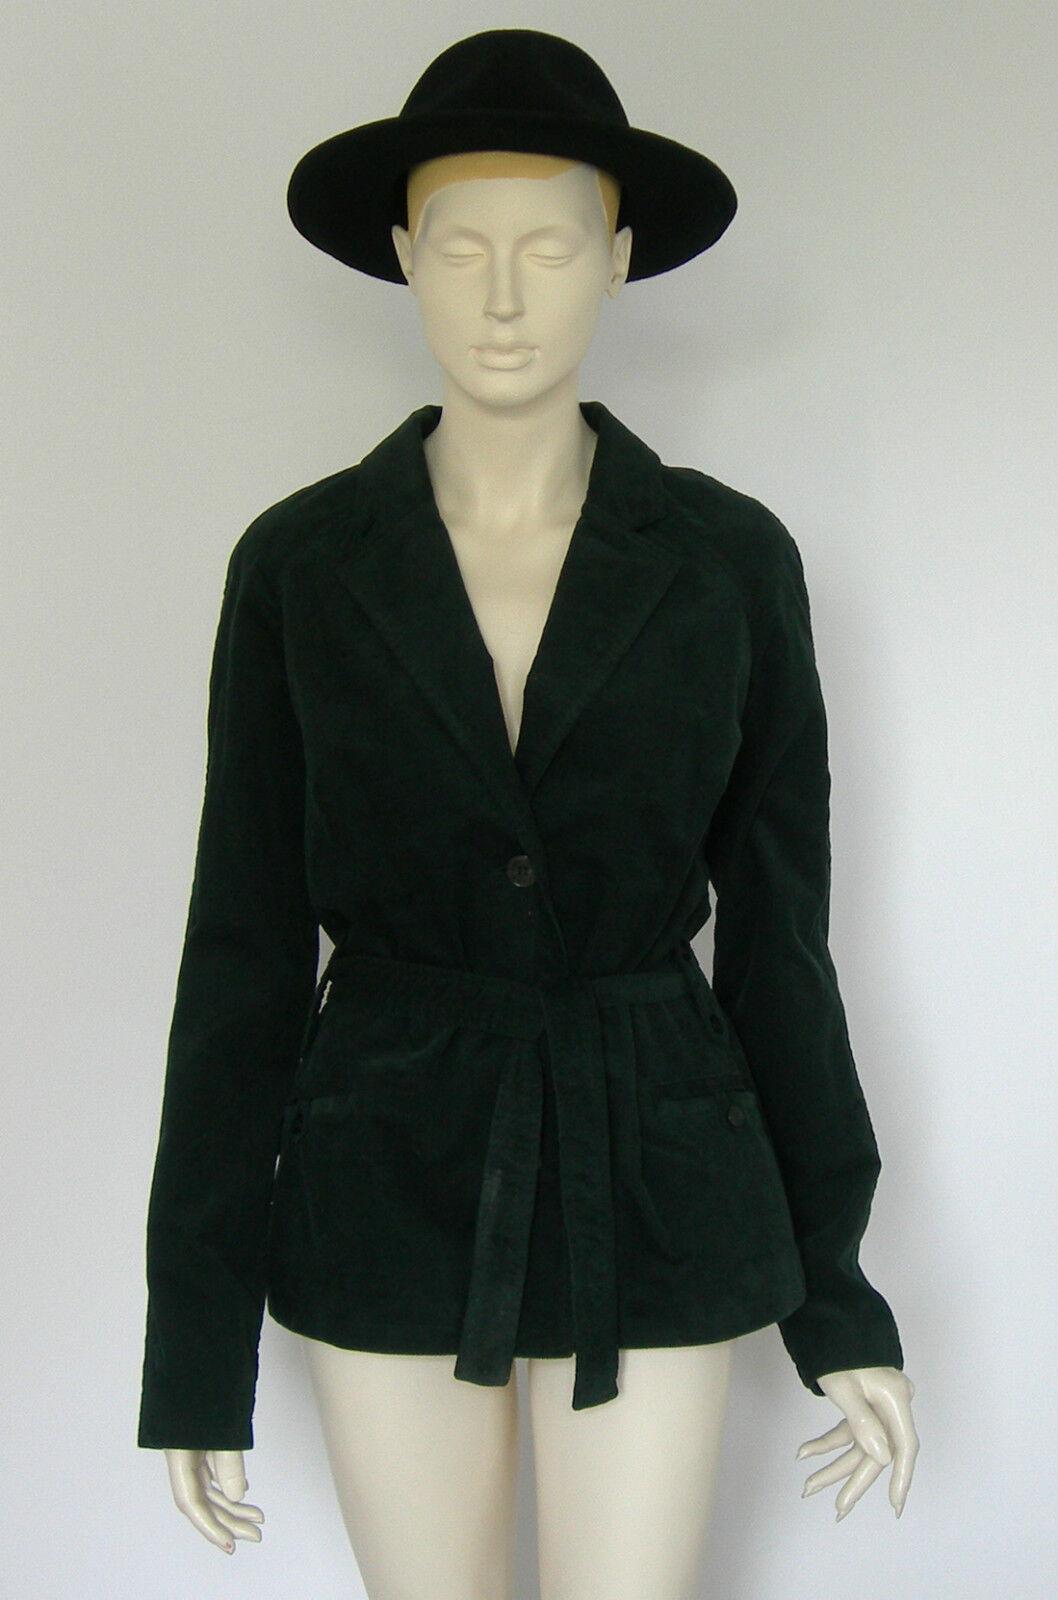 Très jolie Veste blacke Neuve en velours avec ceinture